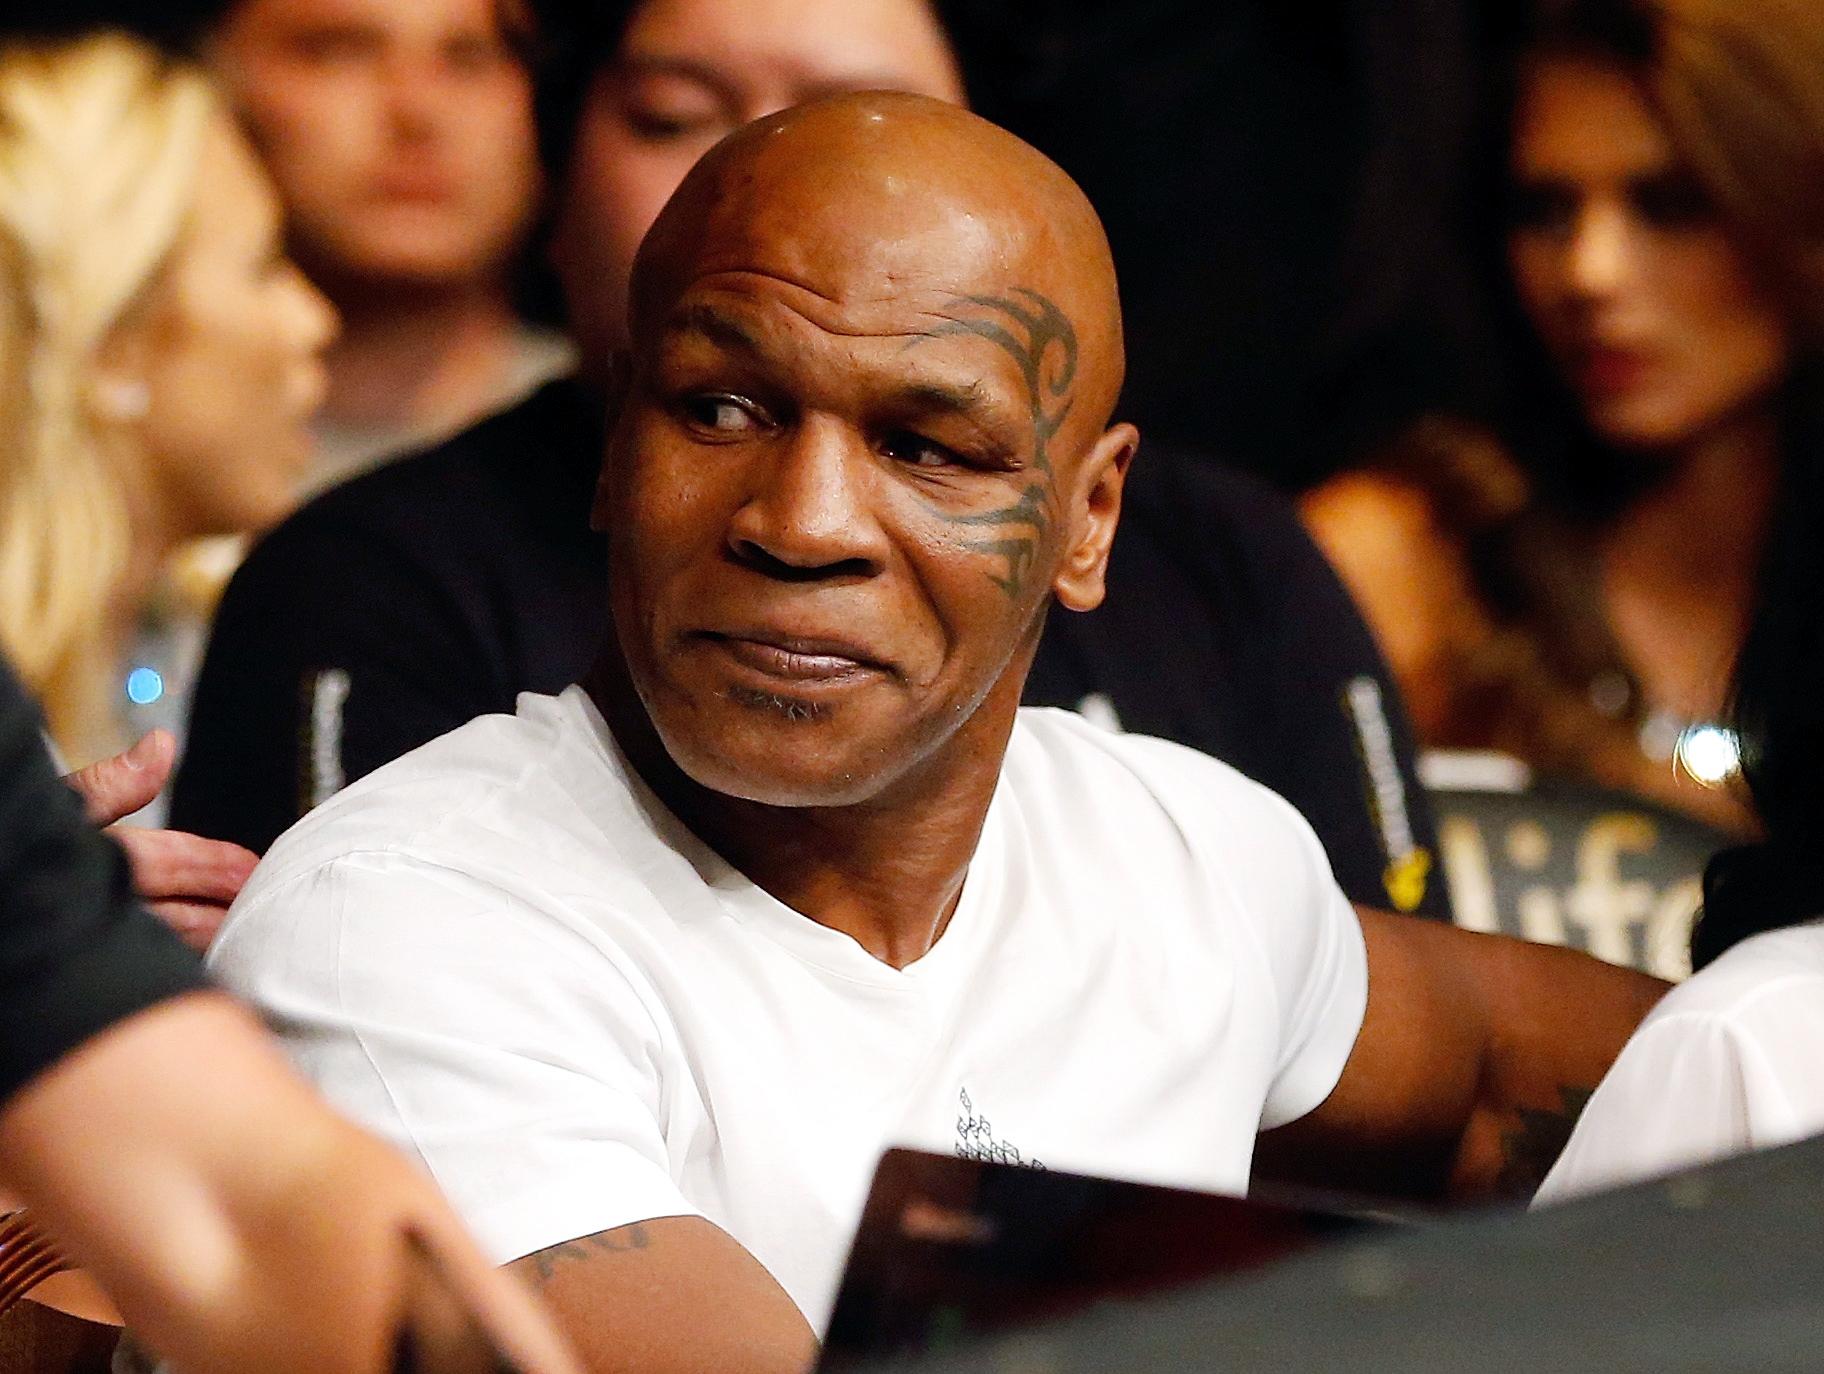 Mike Tyson TrumpMike Tyson